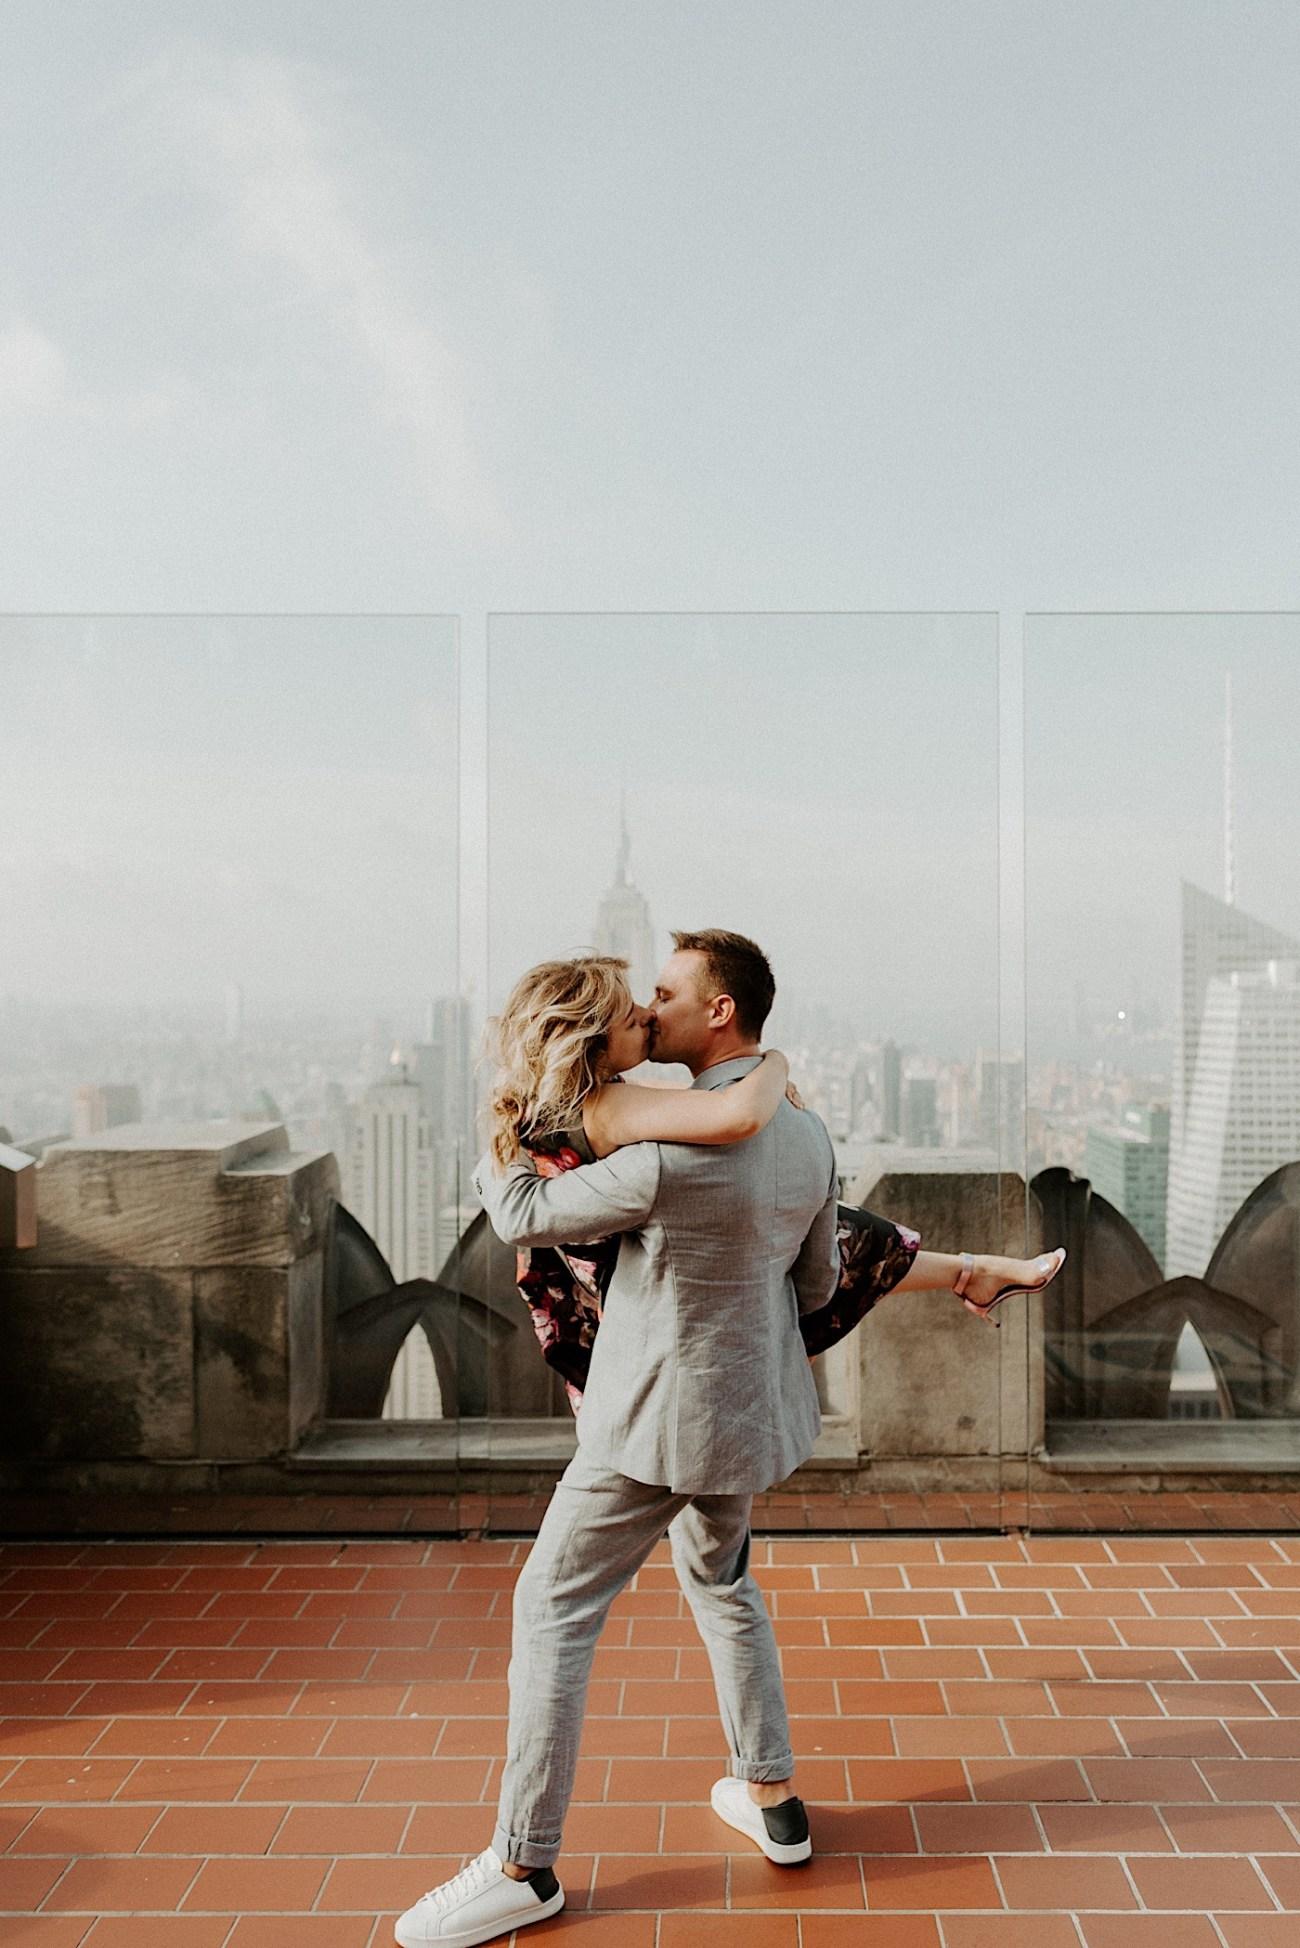 Top Of The Rock Wedding Anniversary NYC Engagement Locations New York Wedding Photographer 31